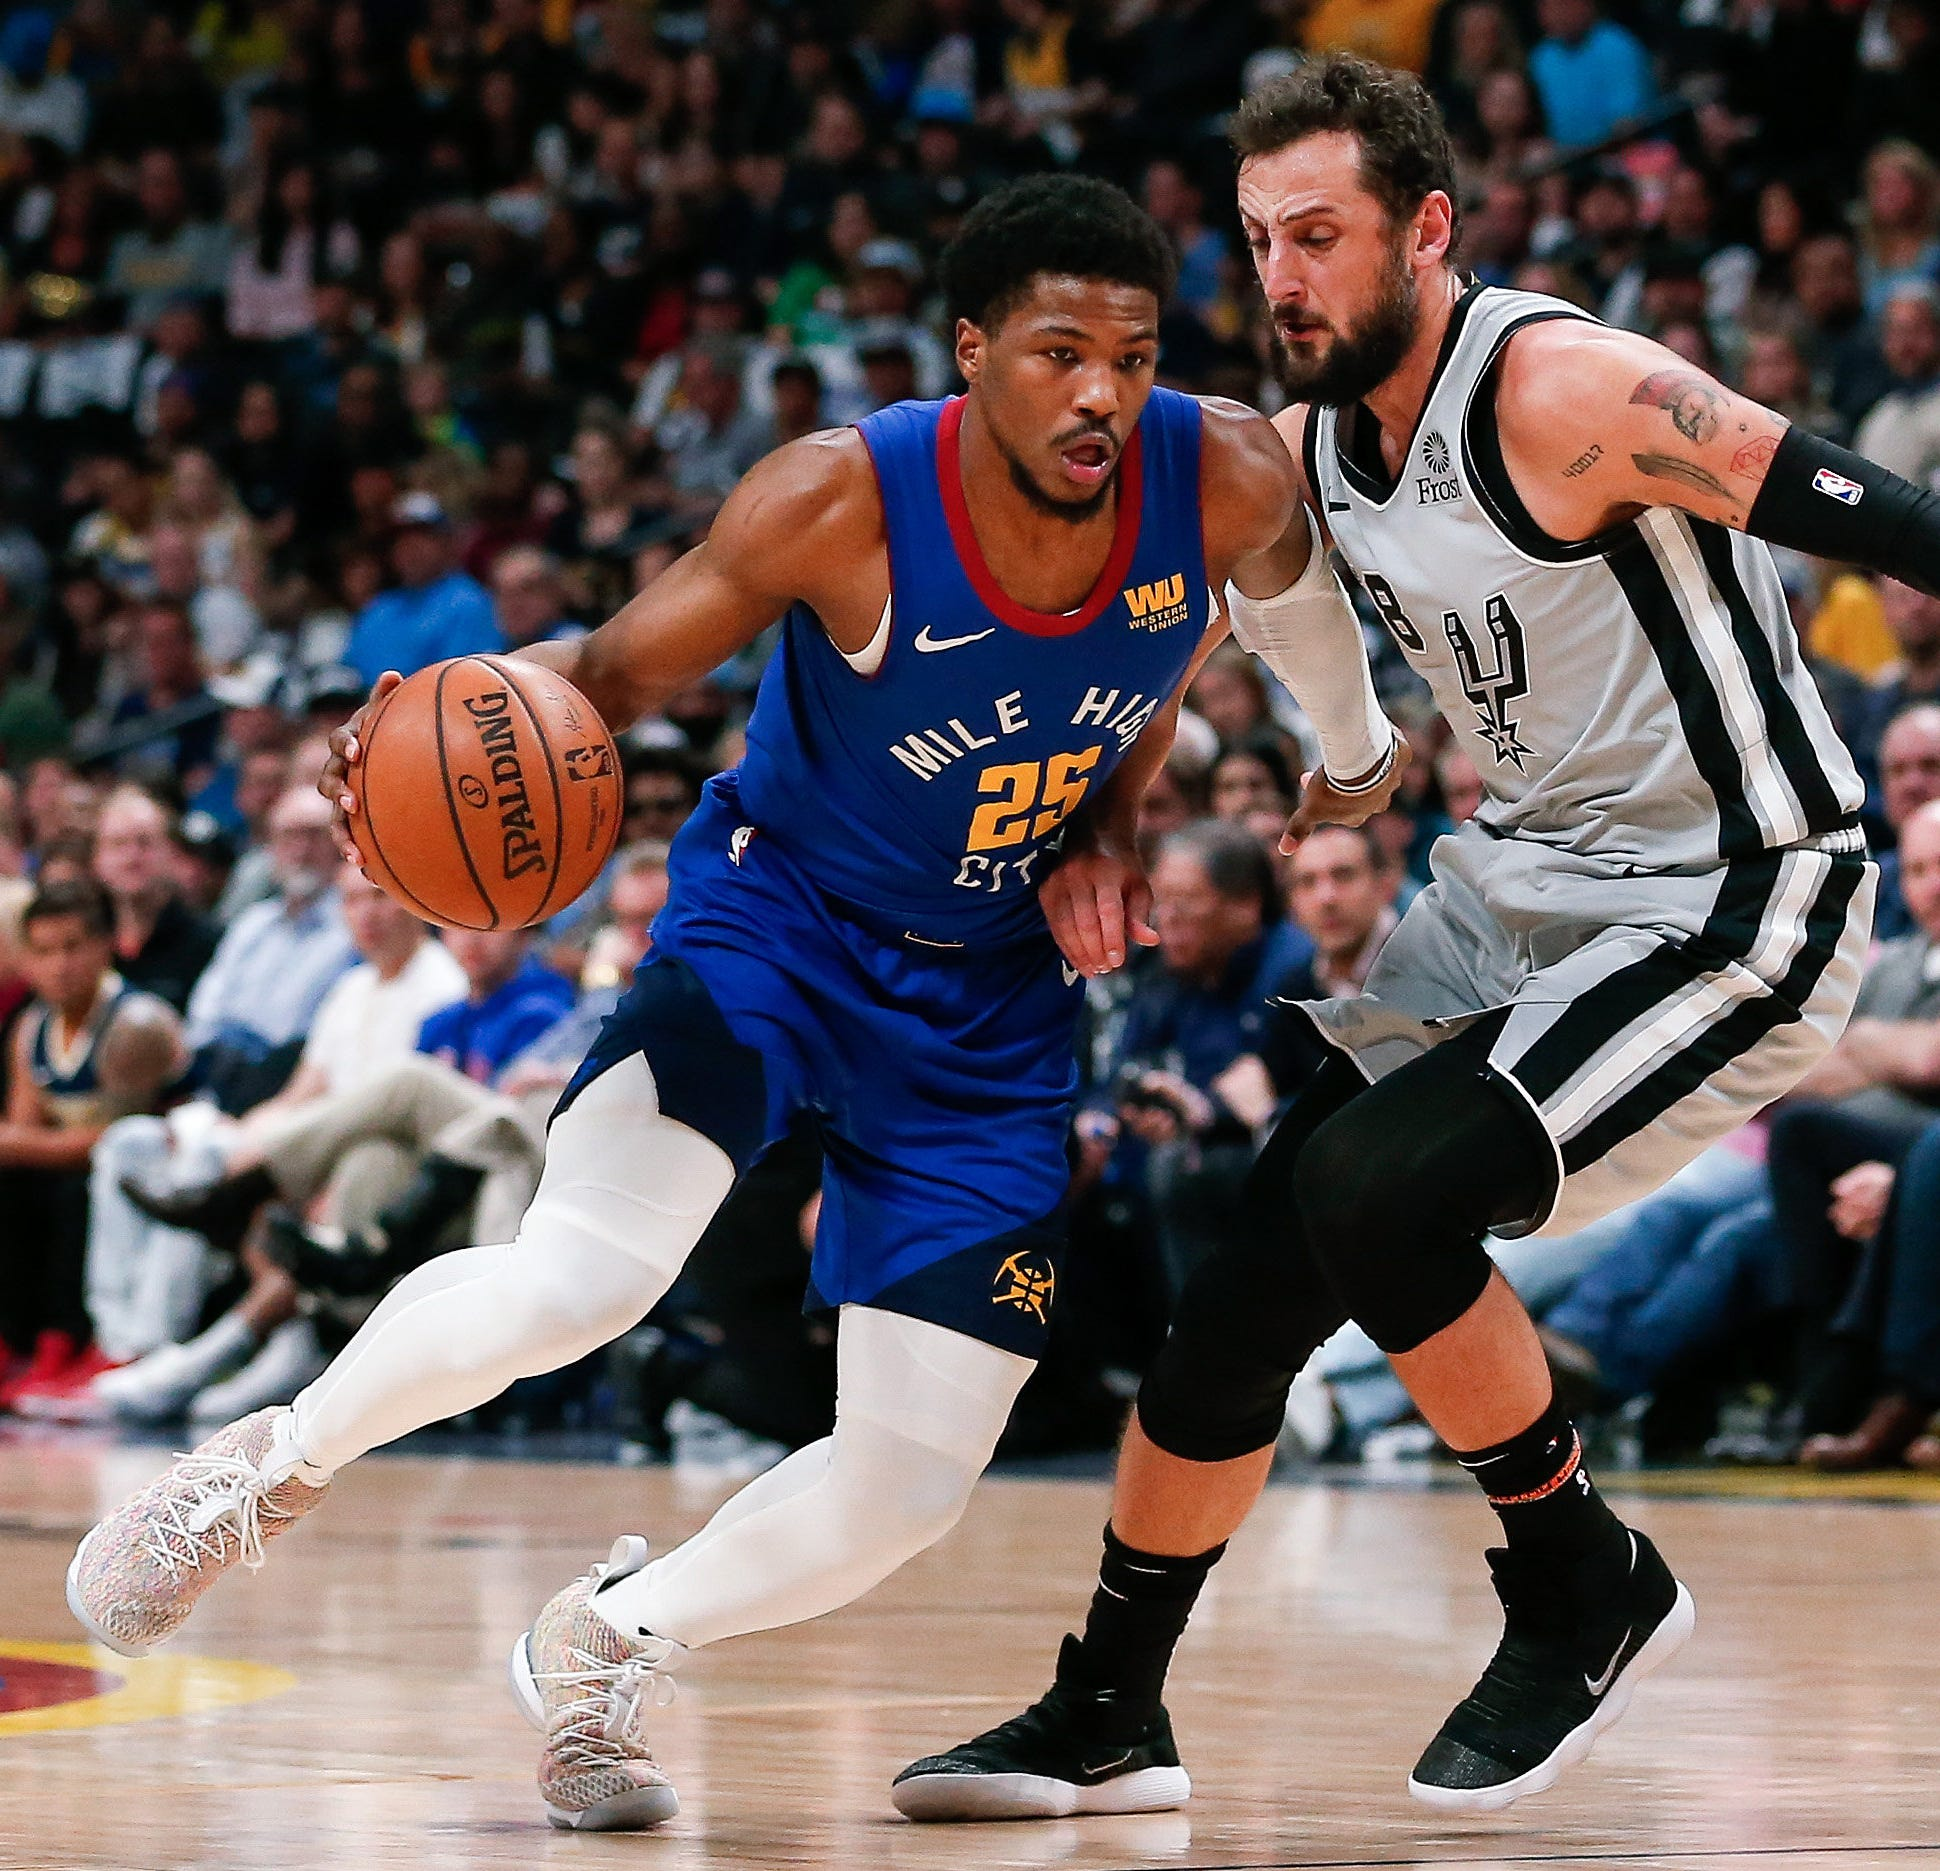 The Denver Nuggets' Malik Beasley controls the ball against San Antonio Spurs guard Marco Belinelli.